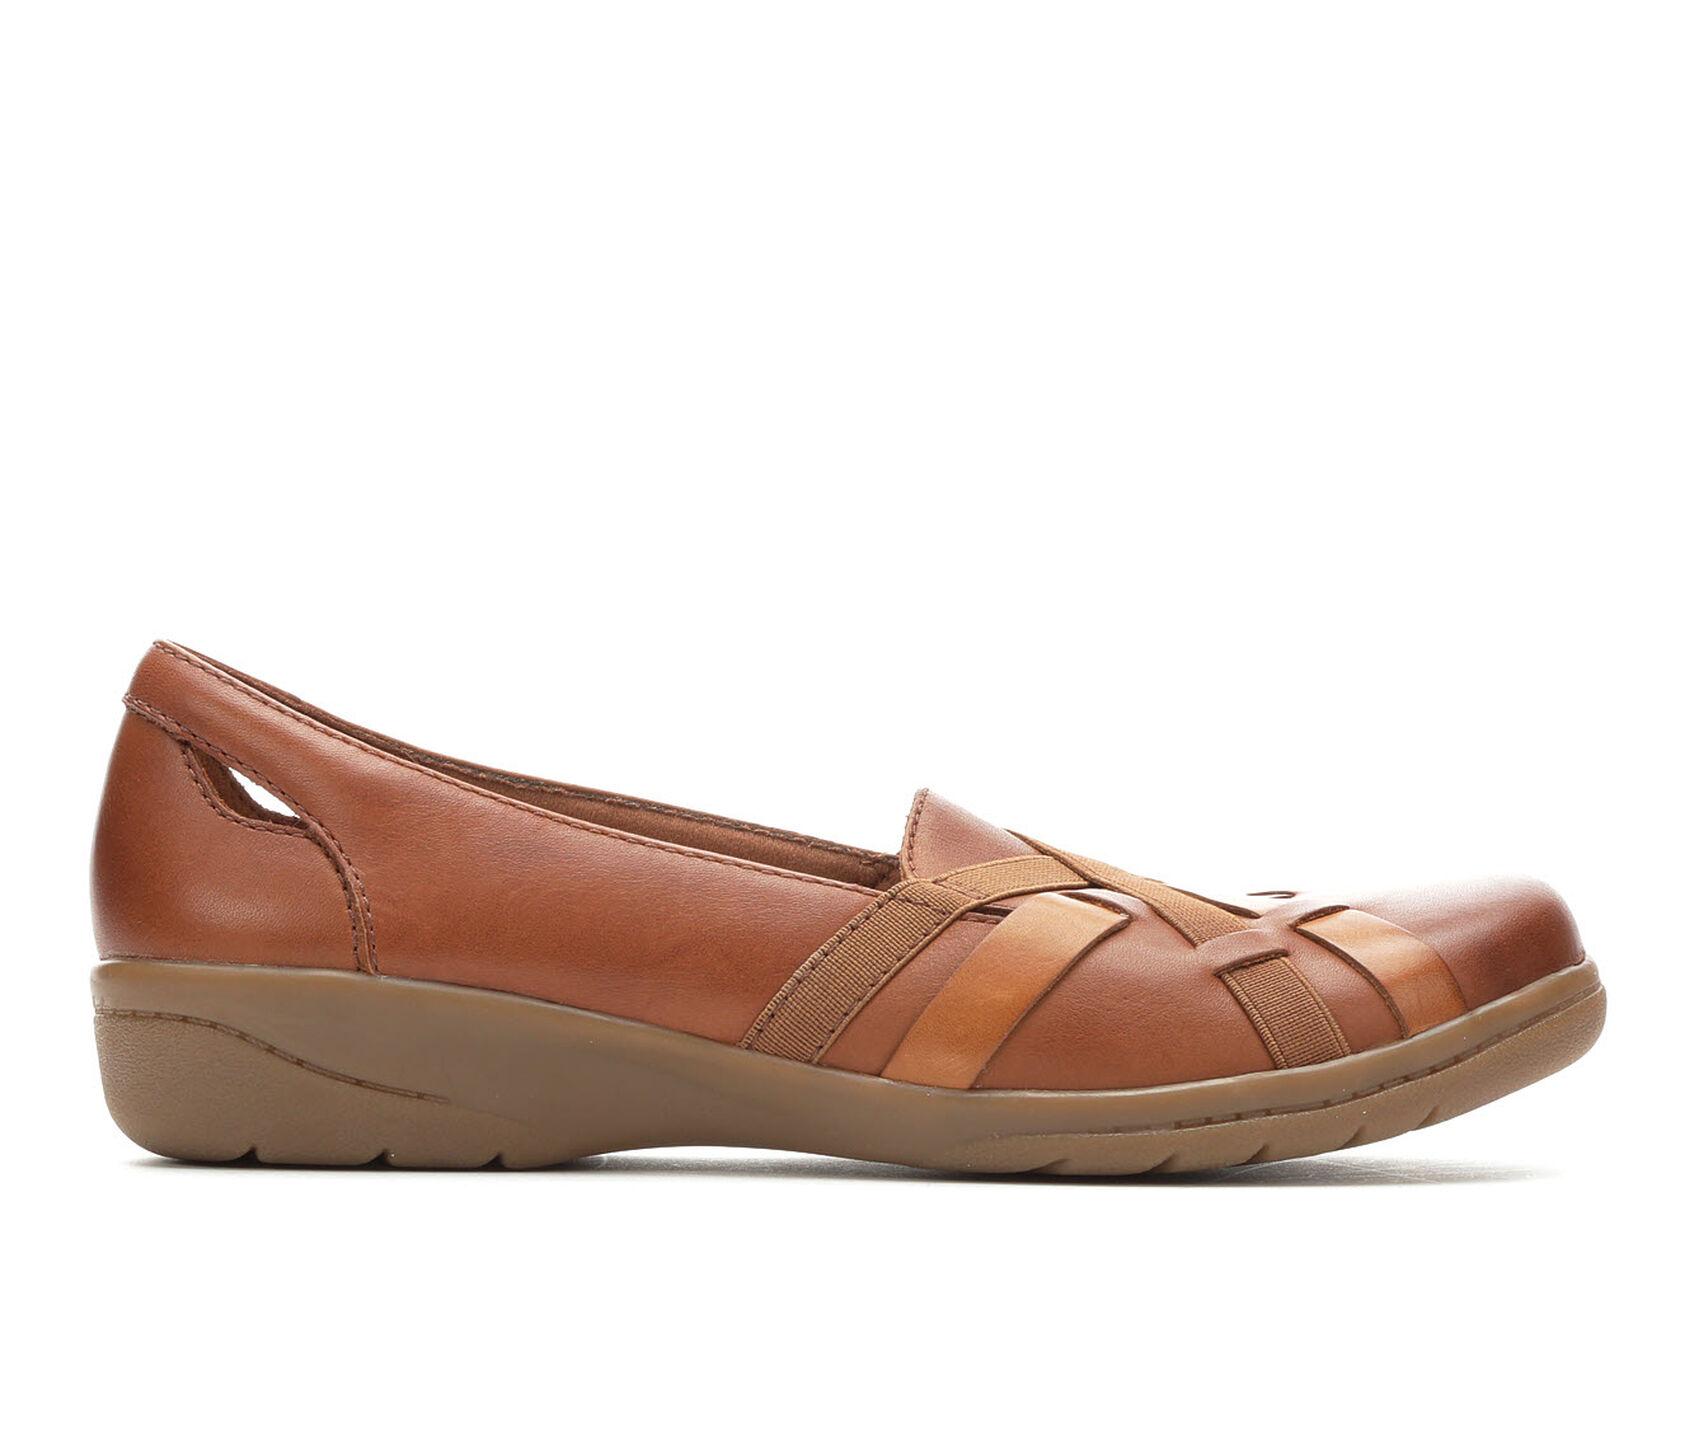 7bccda72ca37 Women s Clarks Cheyn Creek Shoes